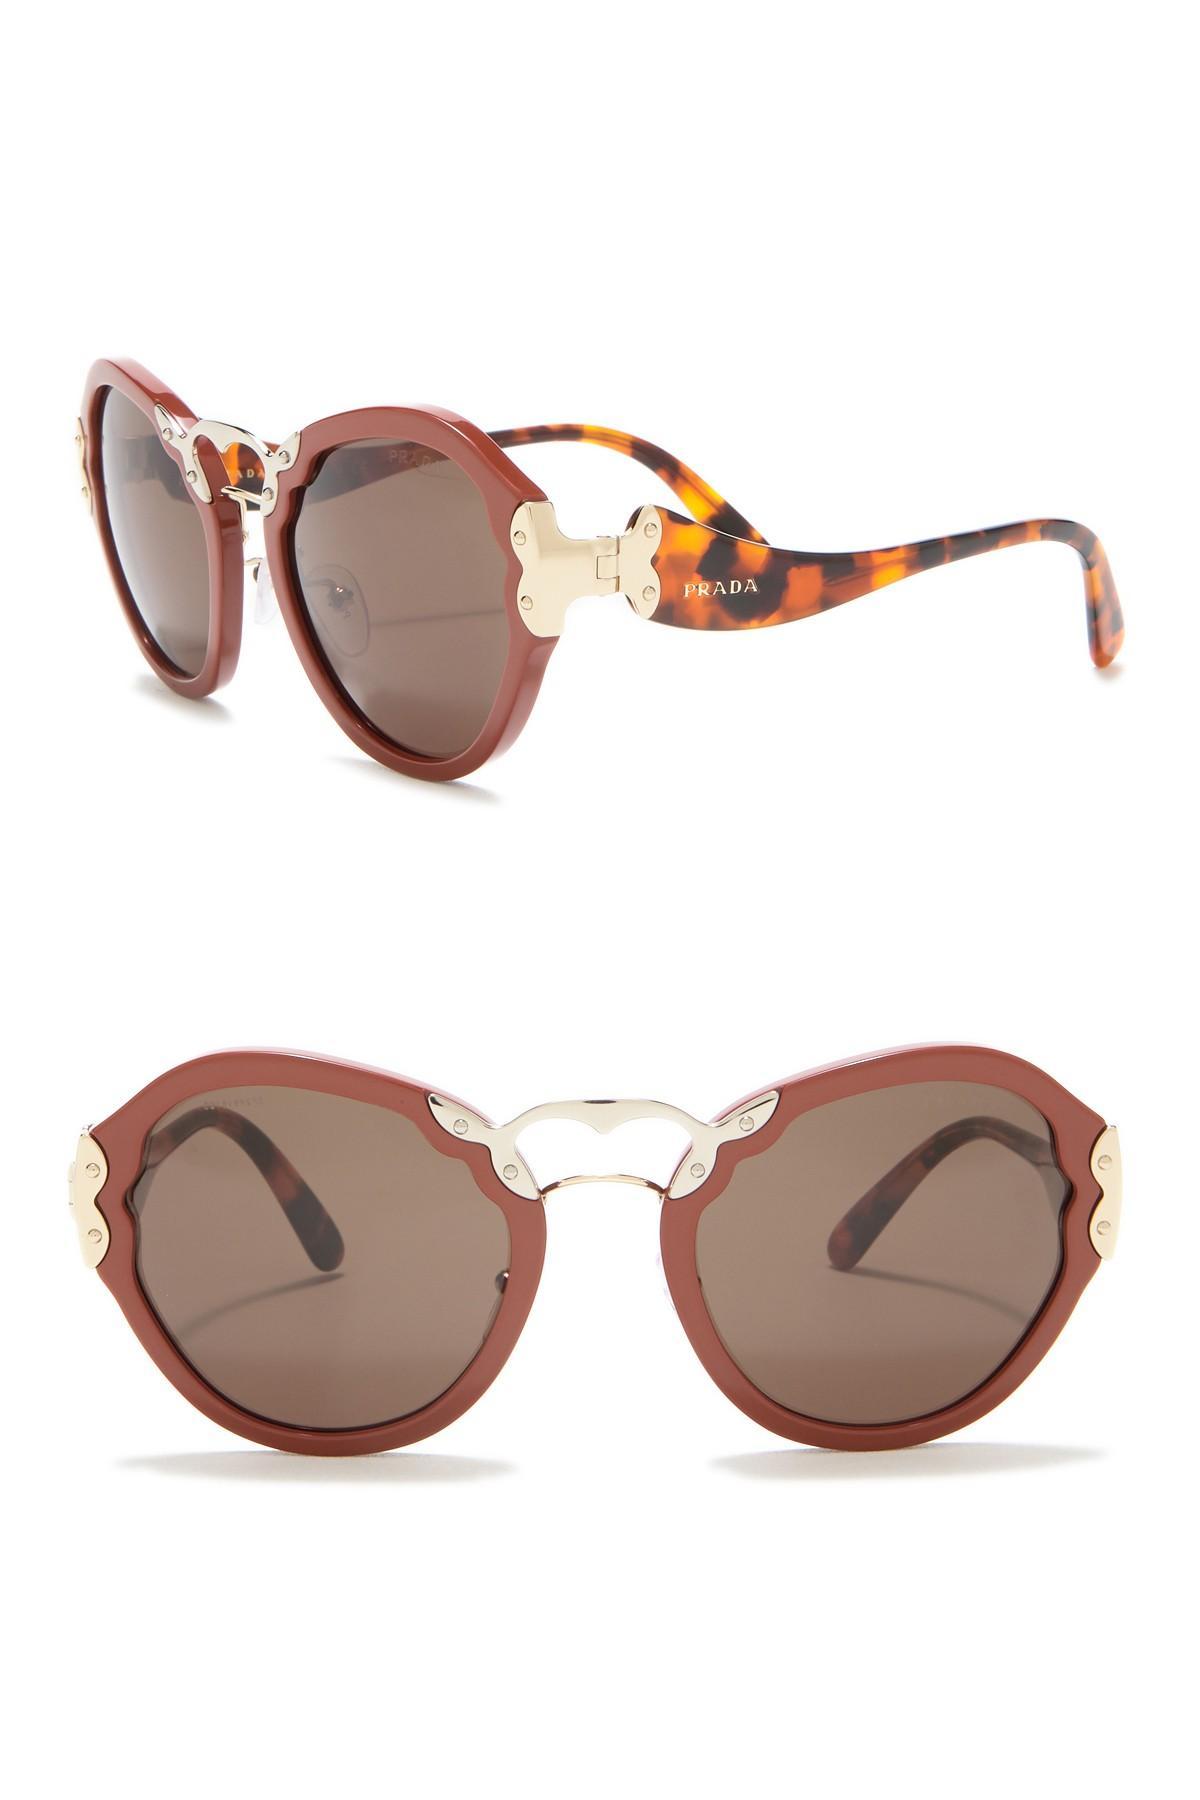 52849a0b76473 Prada Irregular Catwalk 54mm Sunglasses in Orange - Lyst